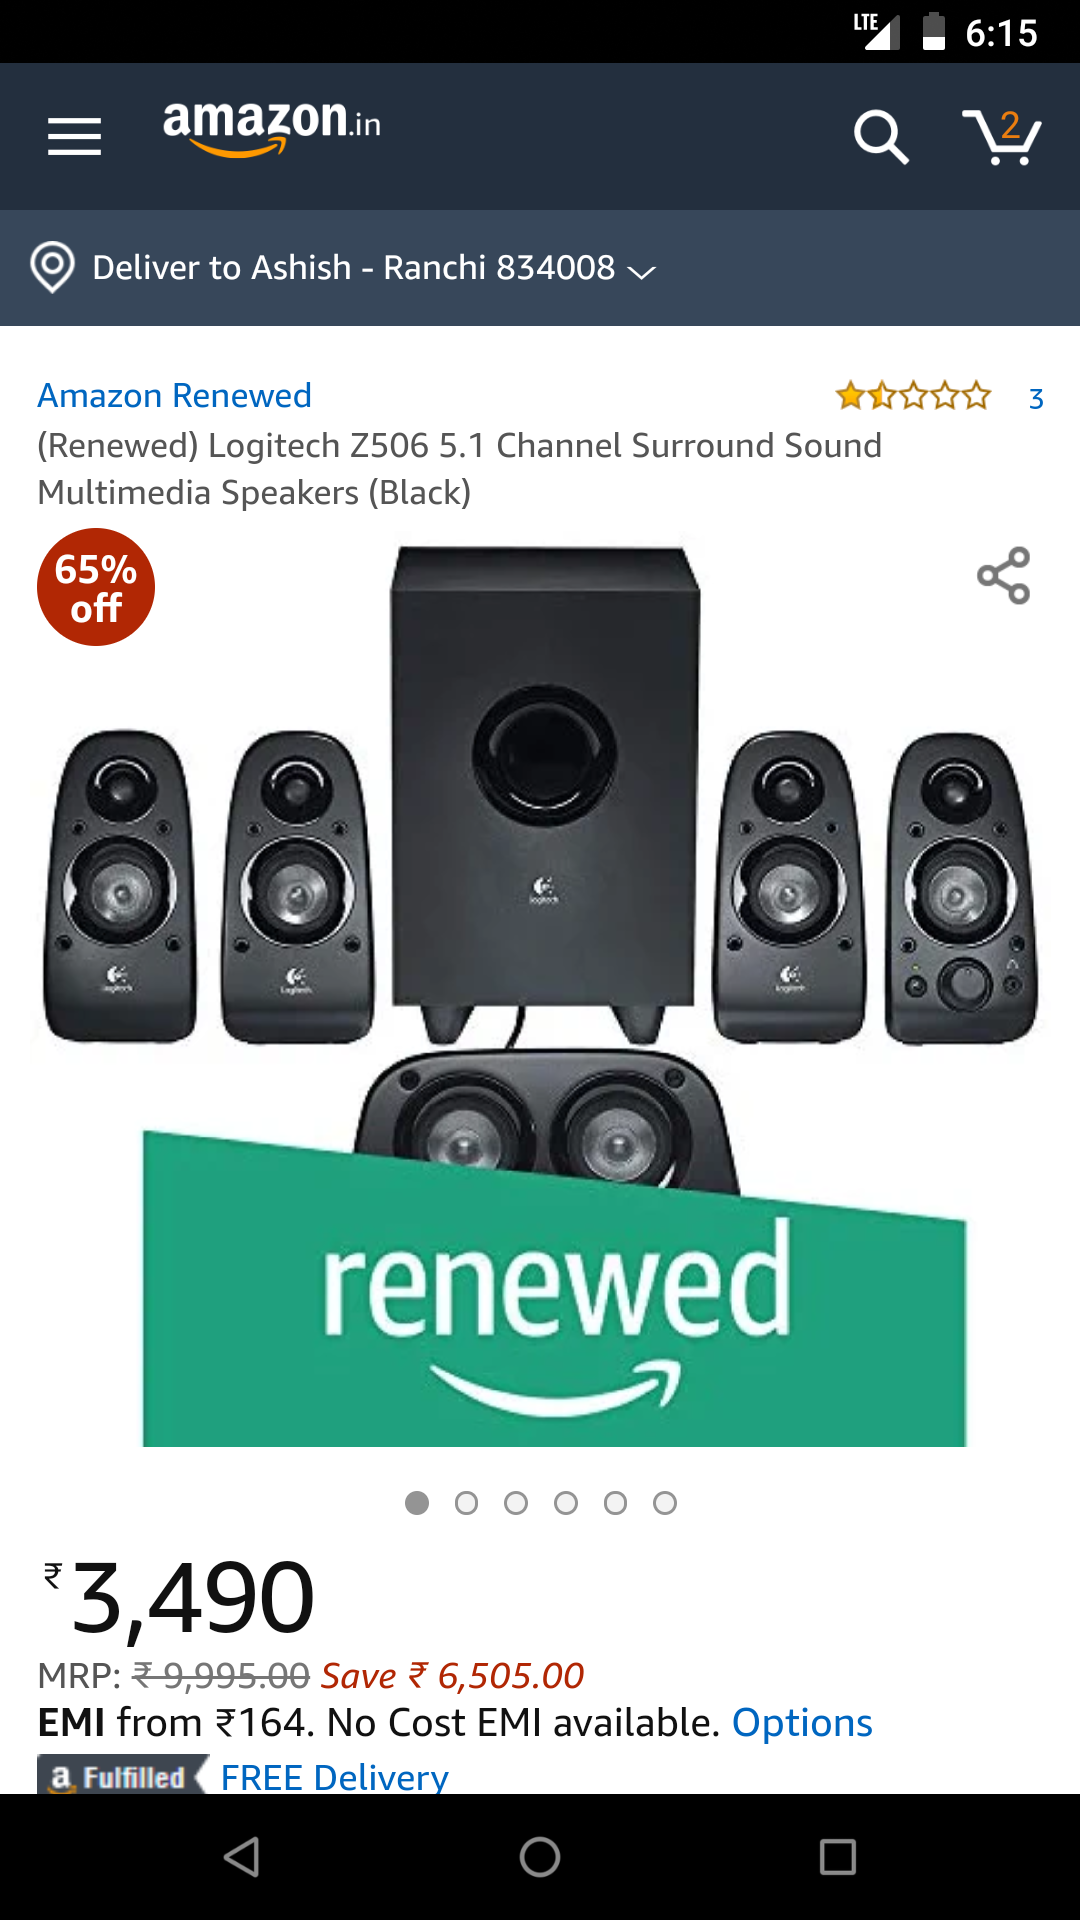 (Renewed) Logitech Z506 5 1 Channel Surround Sound Multimedia Speakers  (Black)